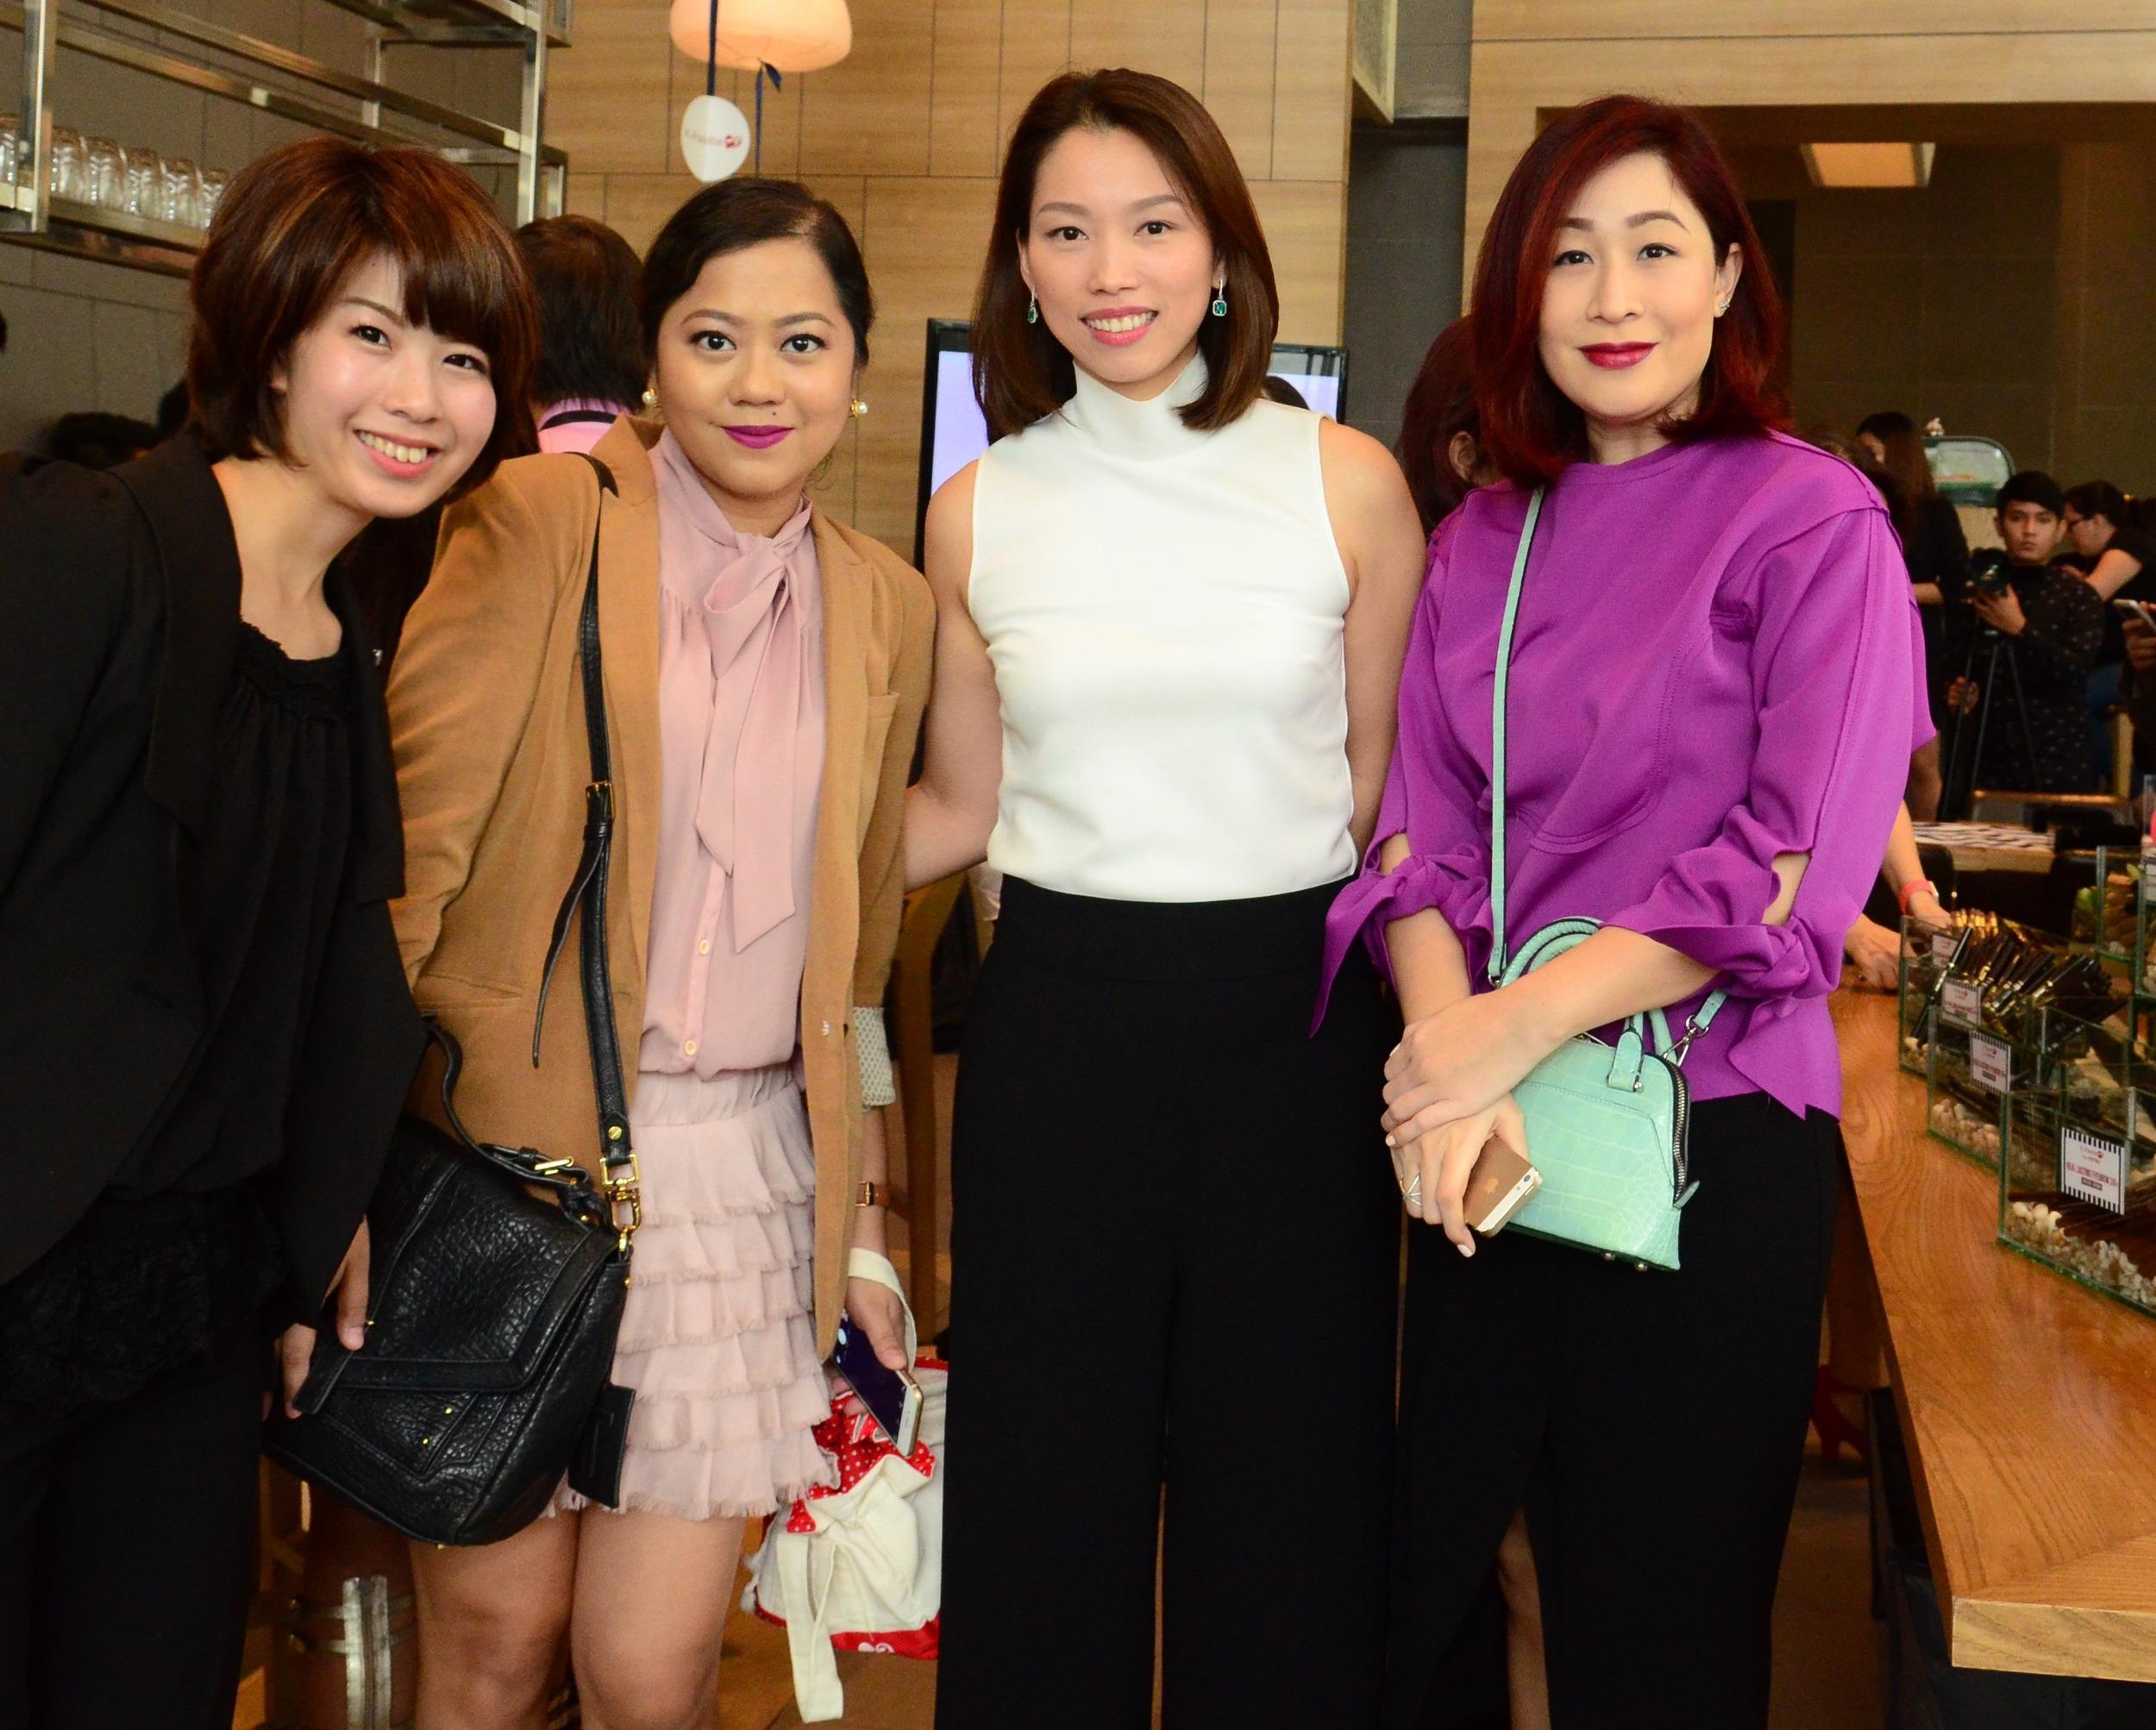 Left to right: Yuko Kameyama, myself, Cheryl Tan-Chua, Agoo Bengzon